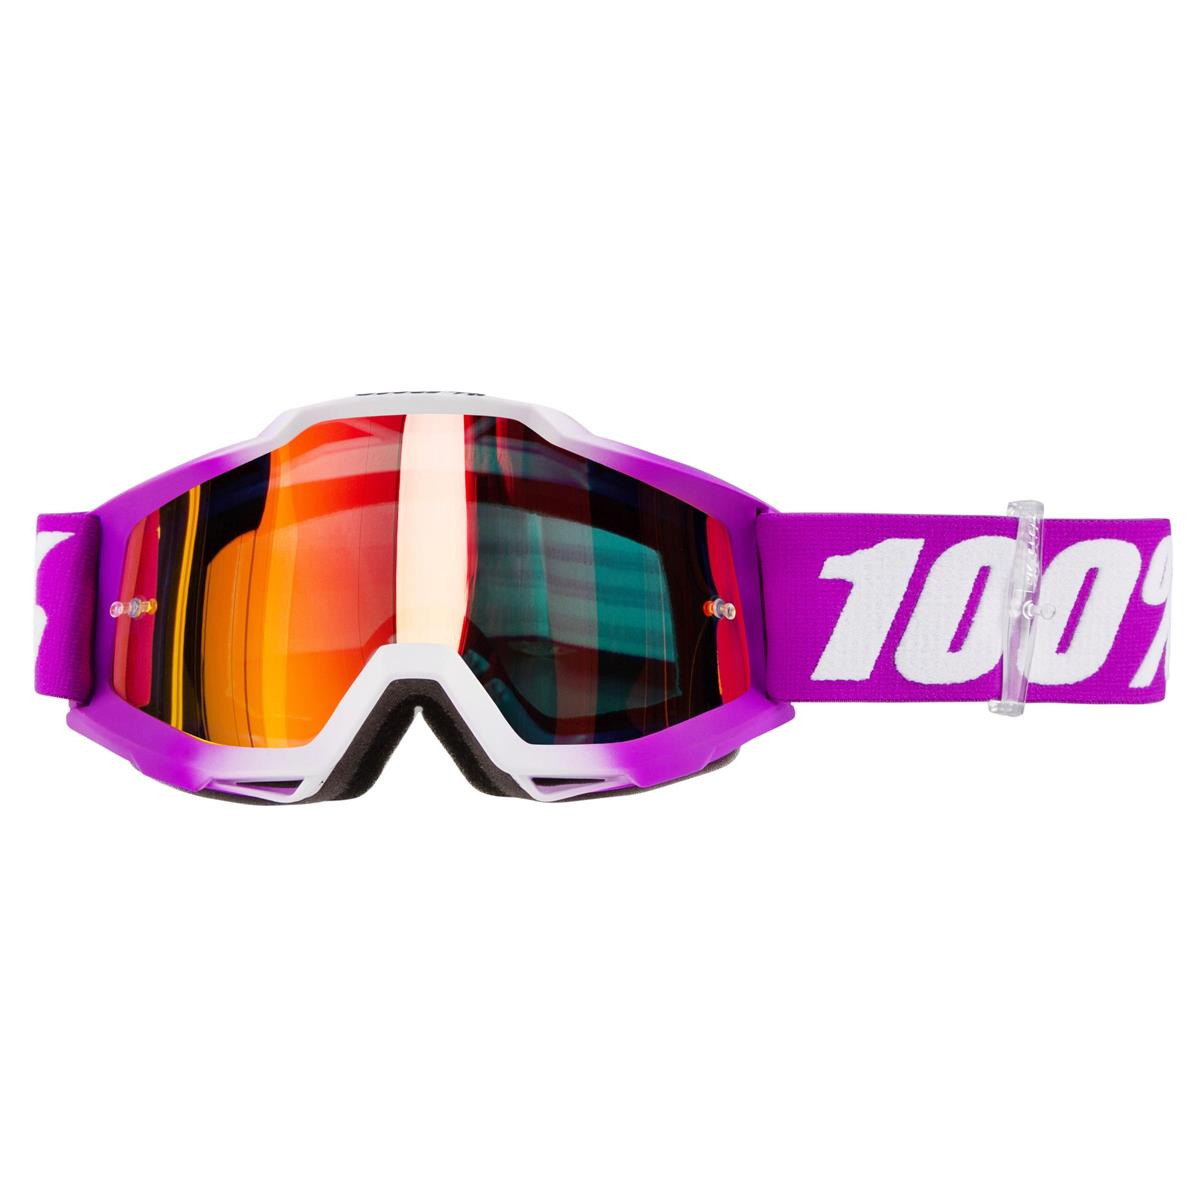 100% Kids Crossbrille The Accuri Framboise - Rot verspiegelt Anti-Fog